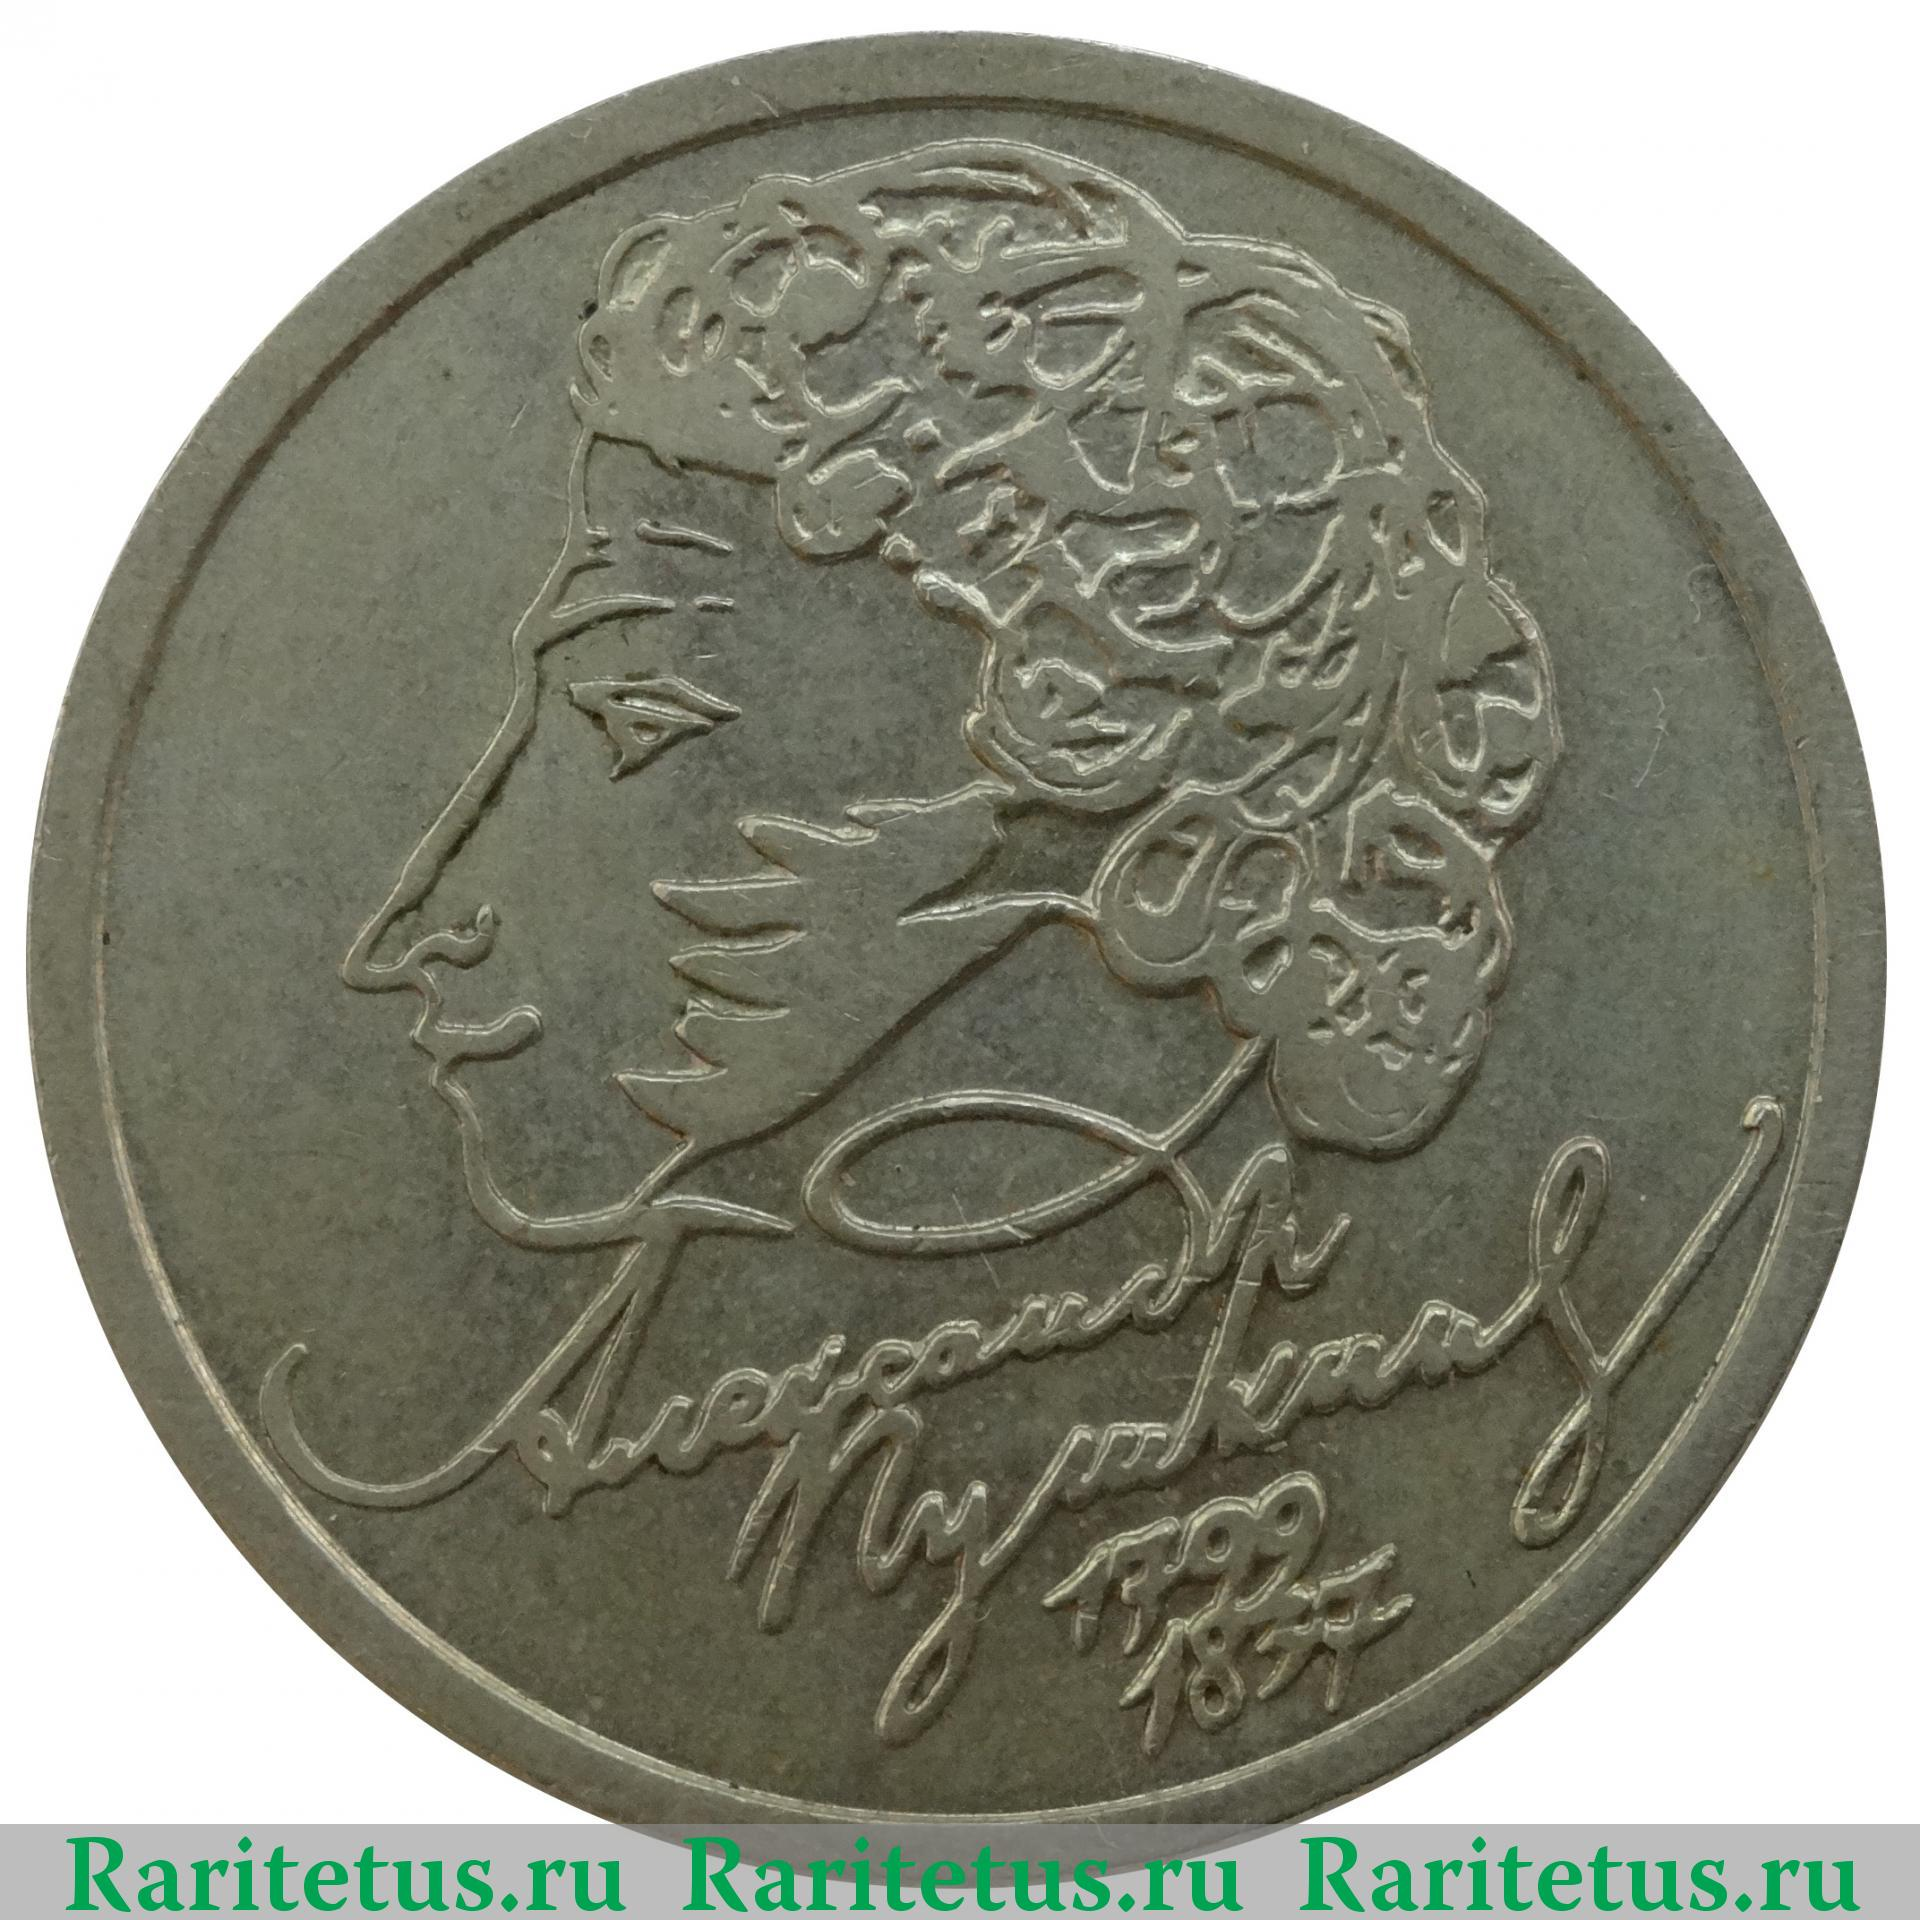 Юбилейная монета пушкин пик комсомола